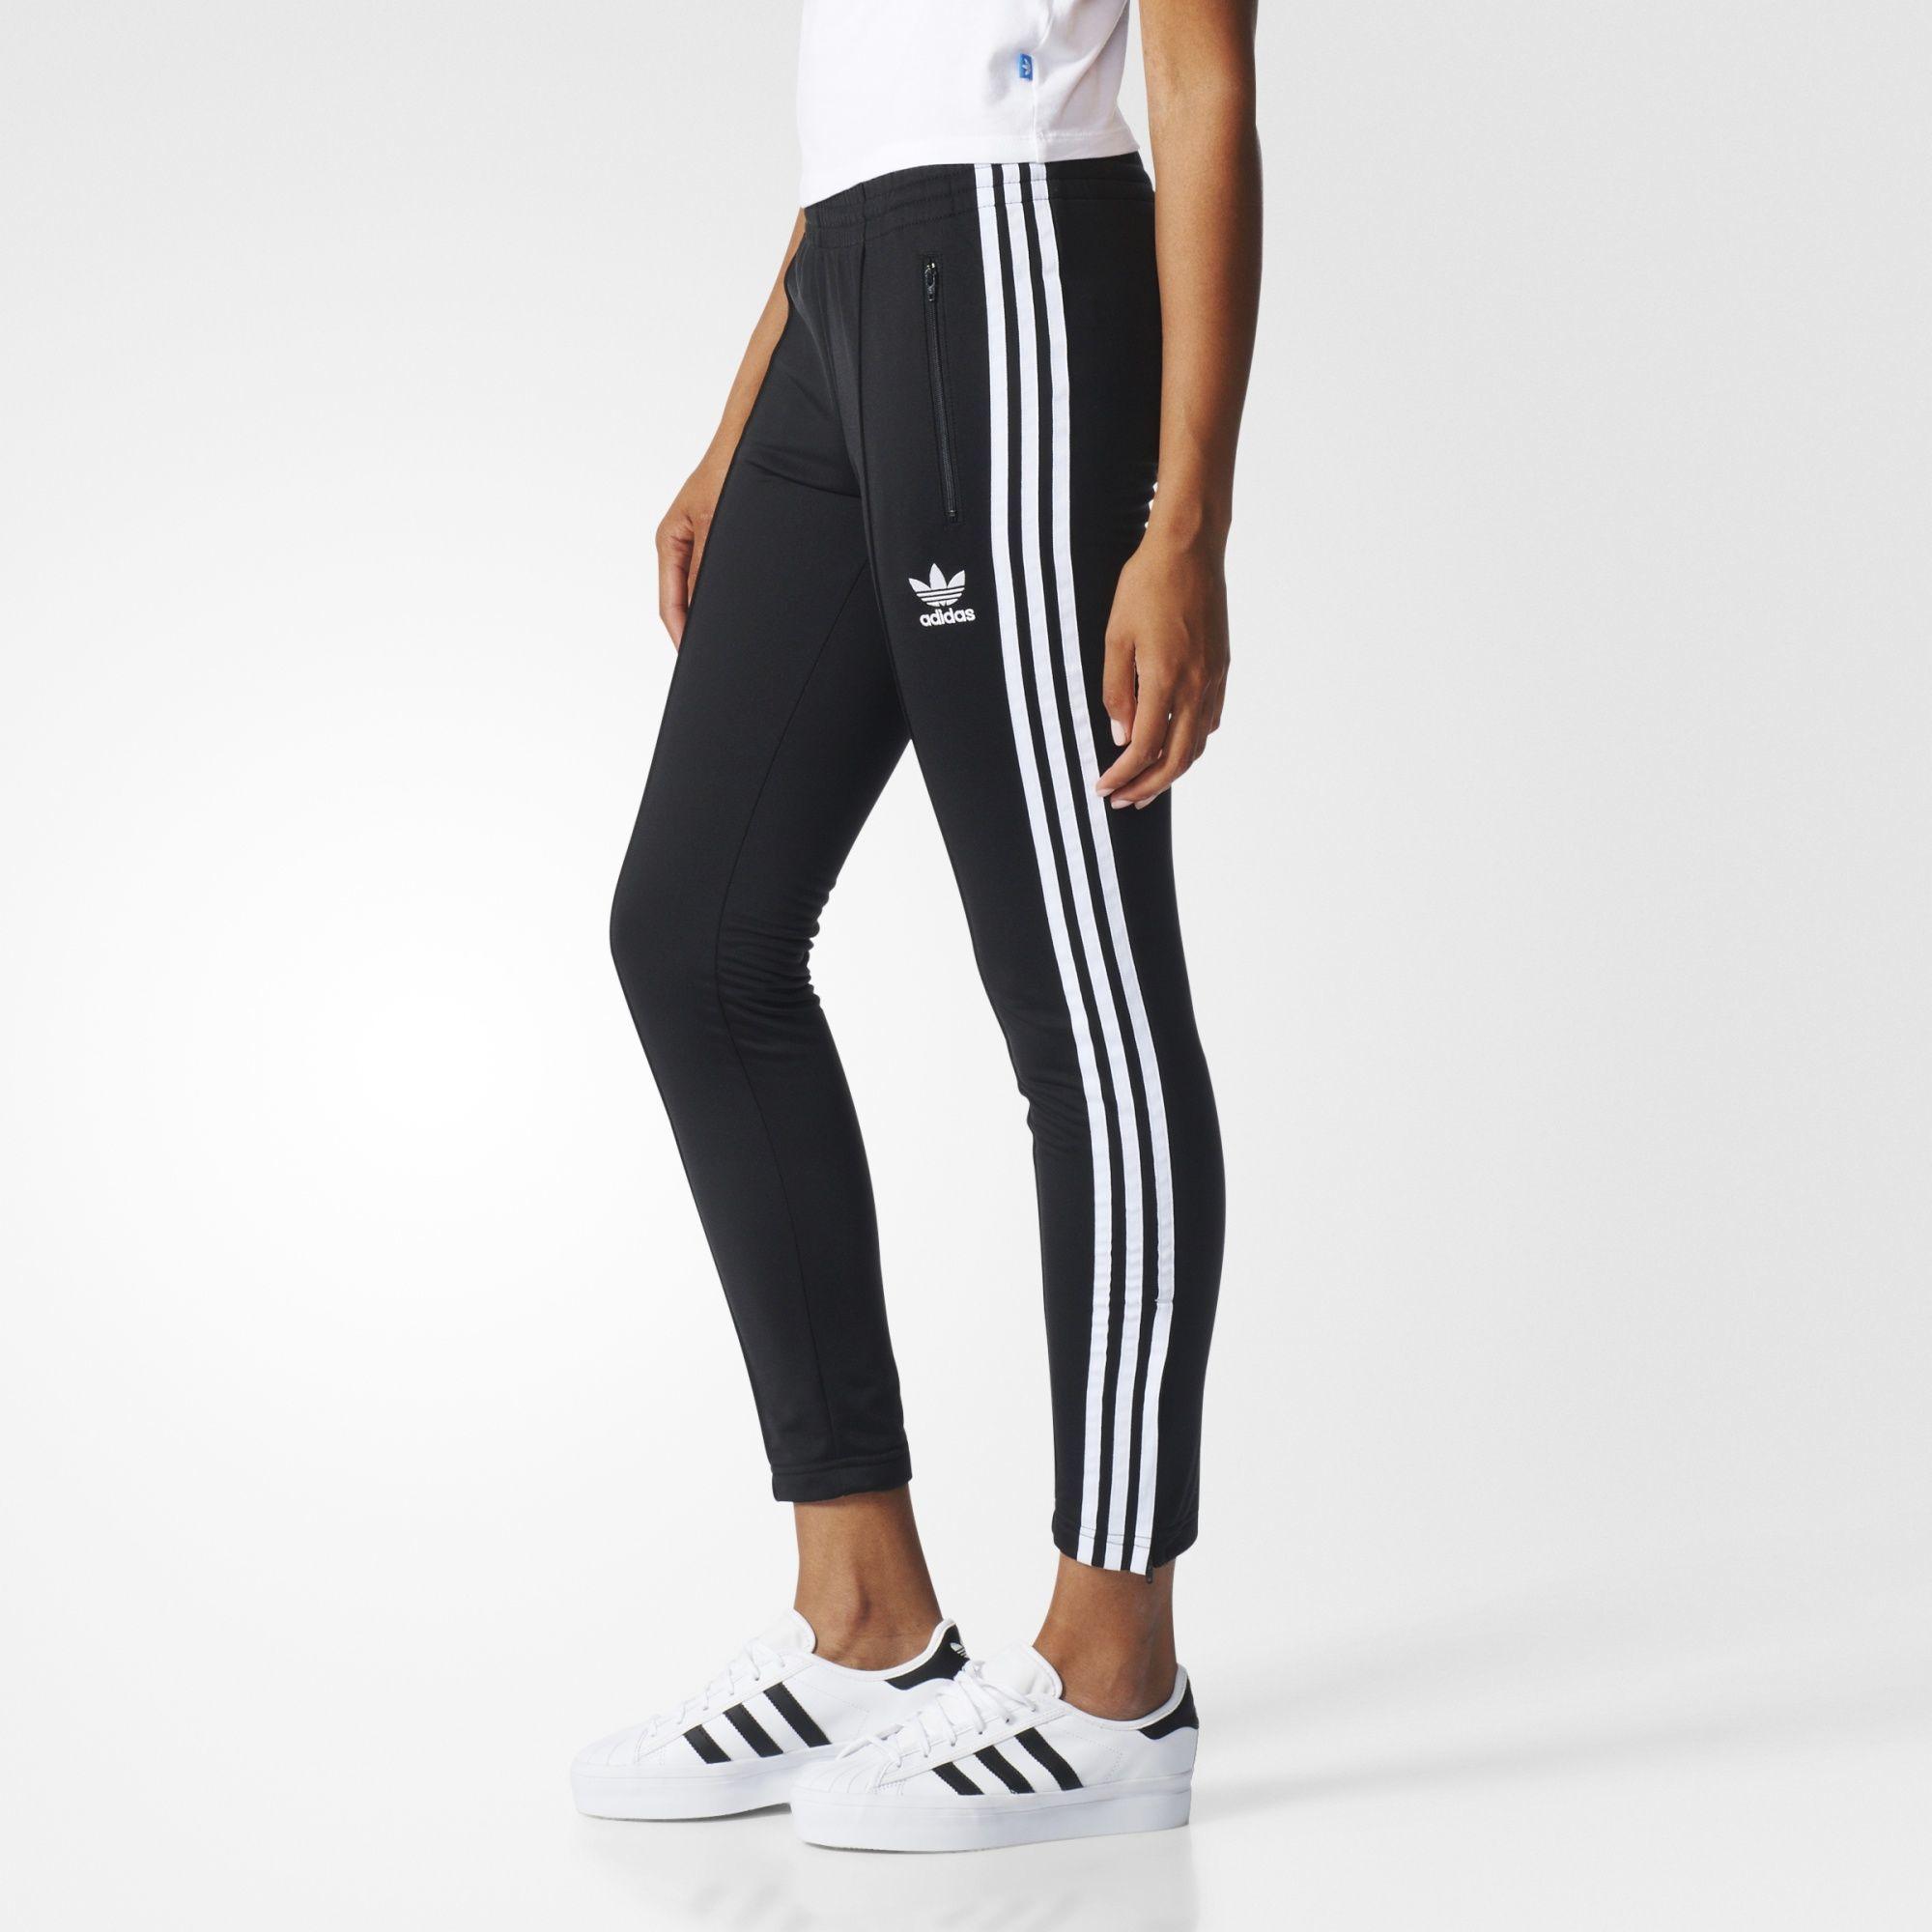 adidas Originals Women's Superstar Truck Pants